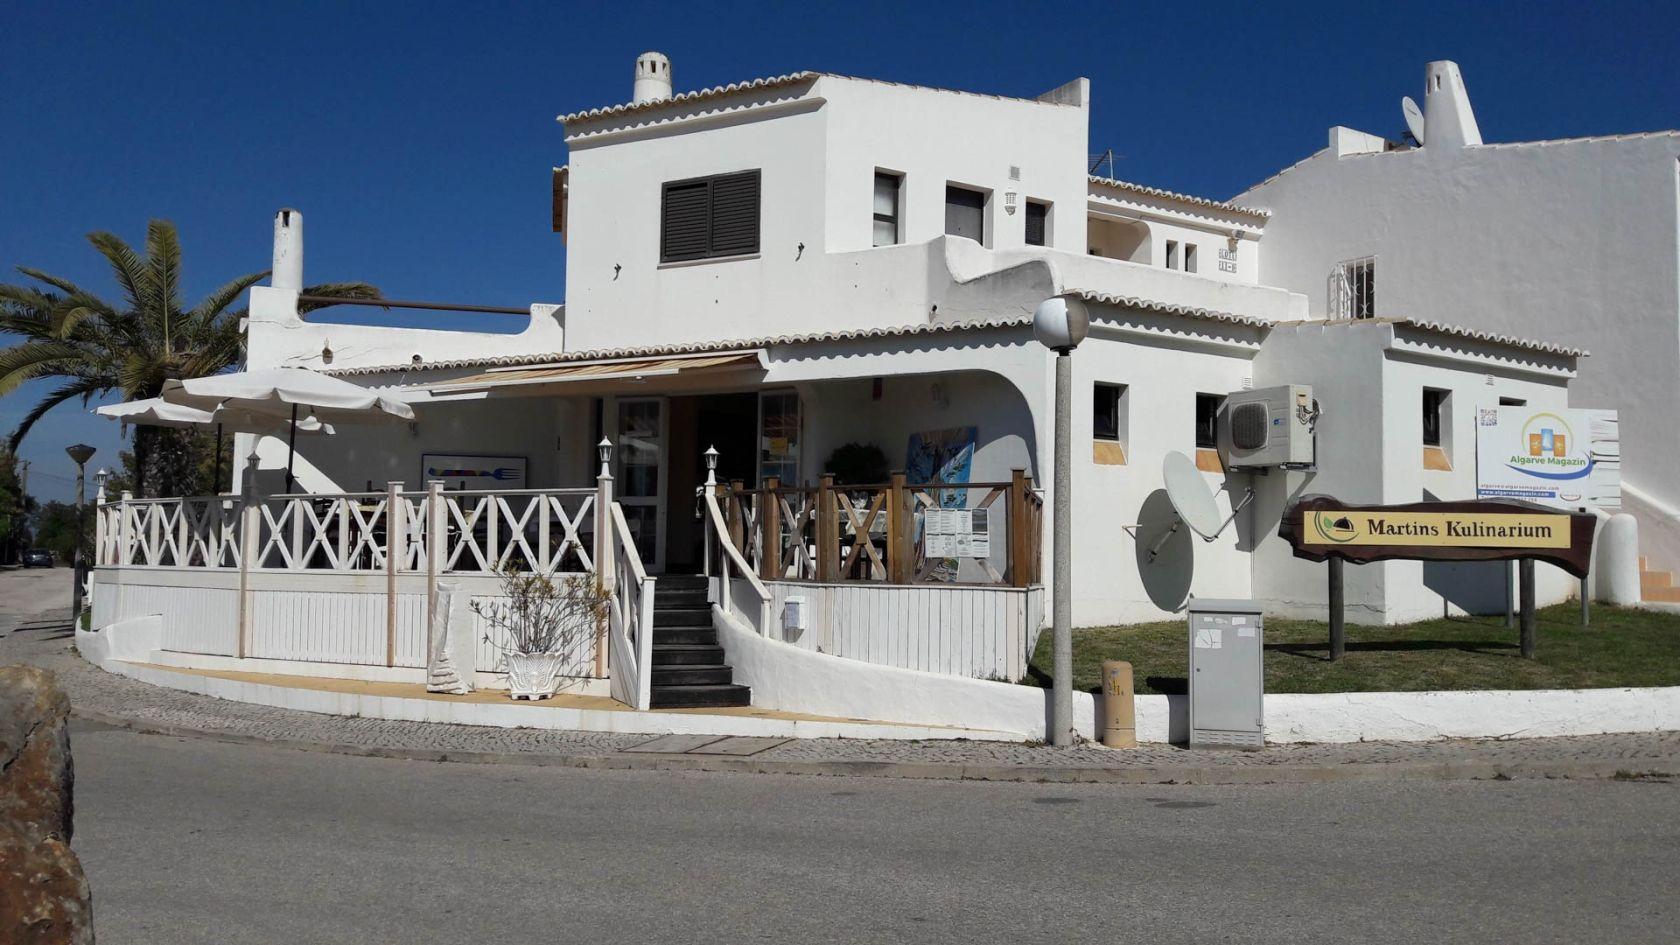 Restaurant MartinsKulinarium